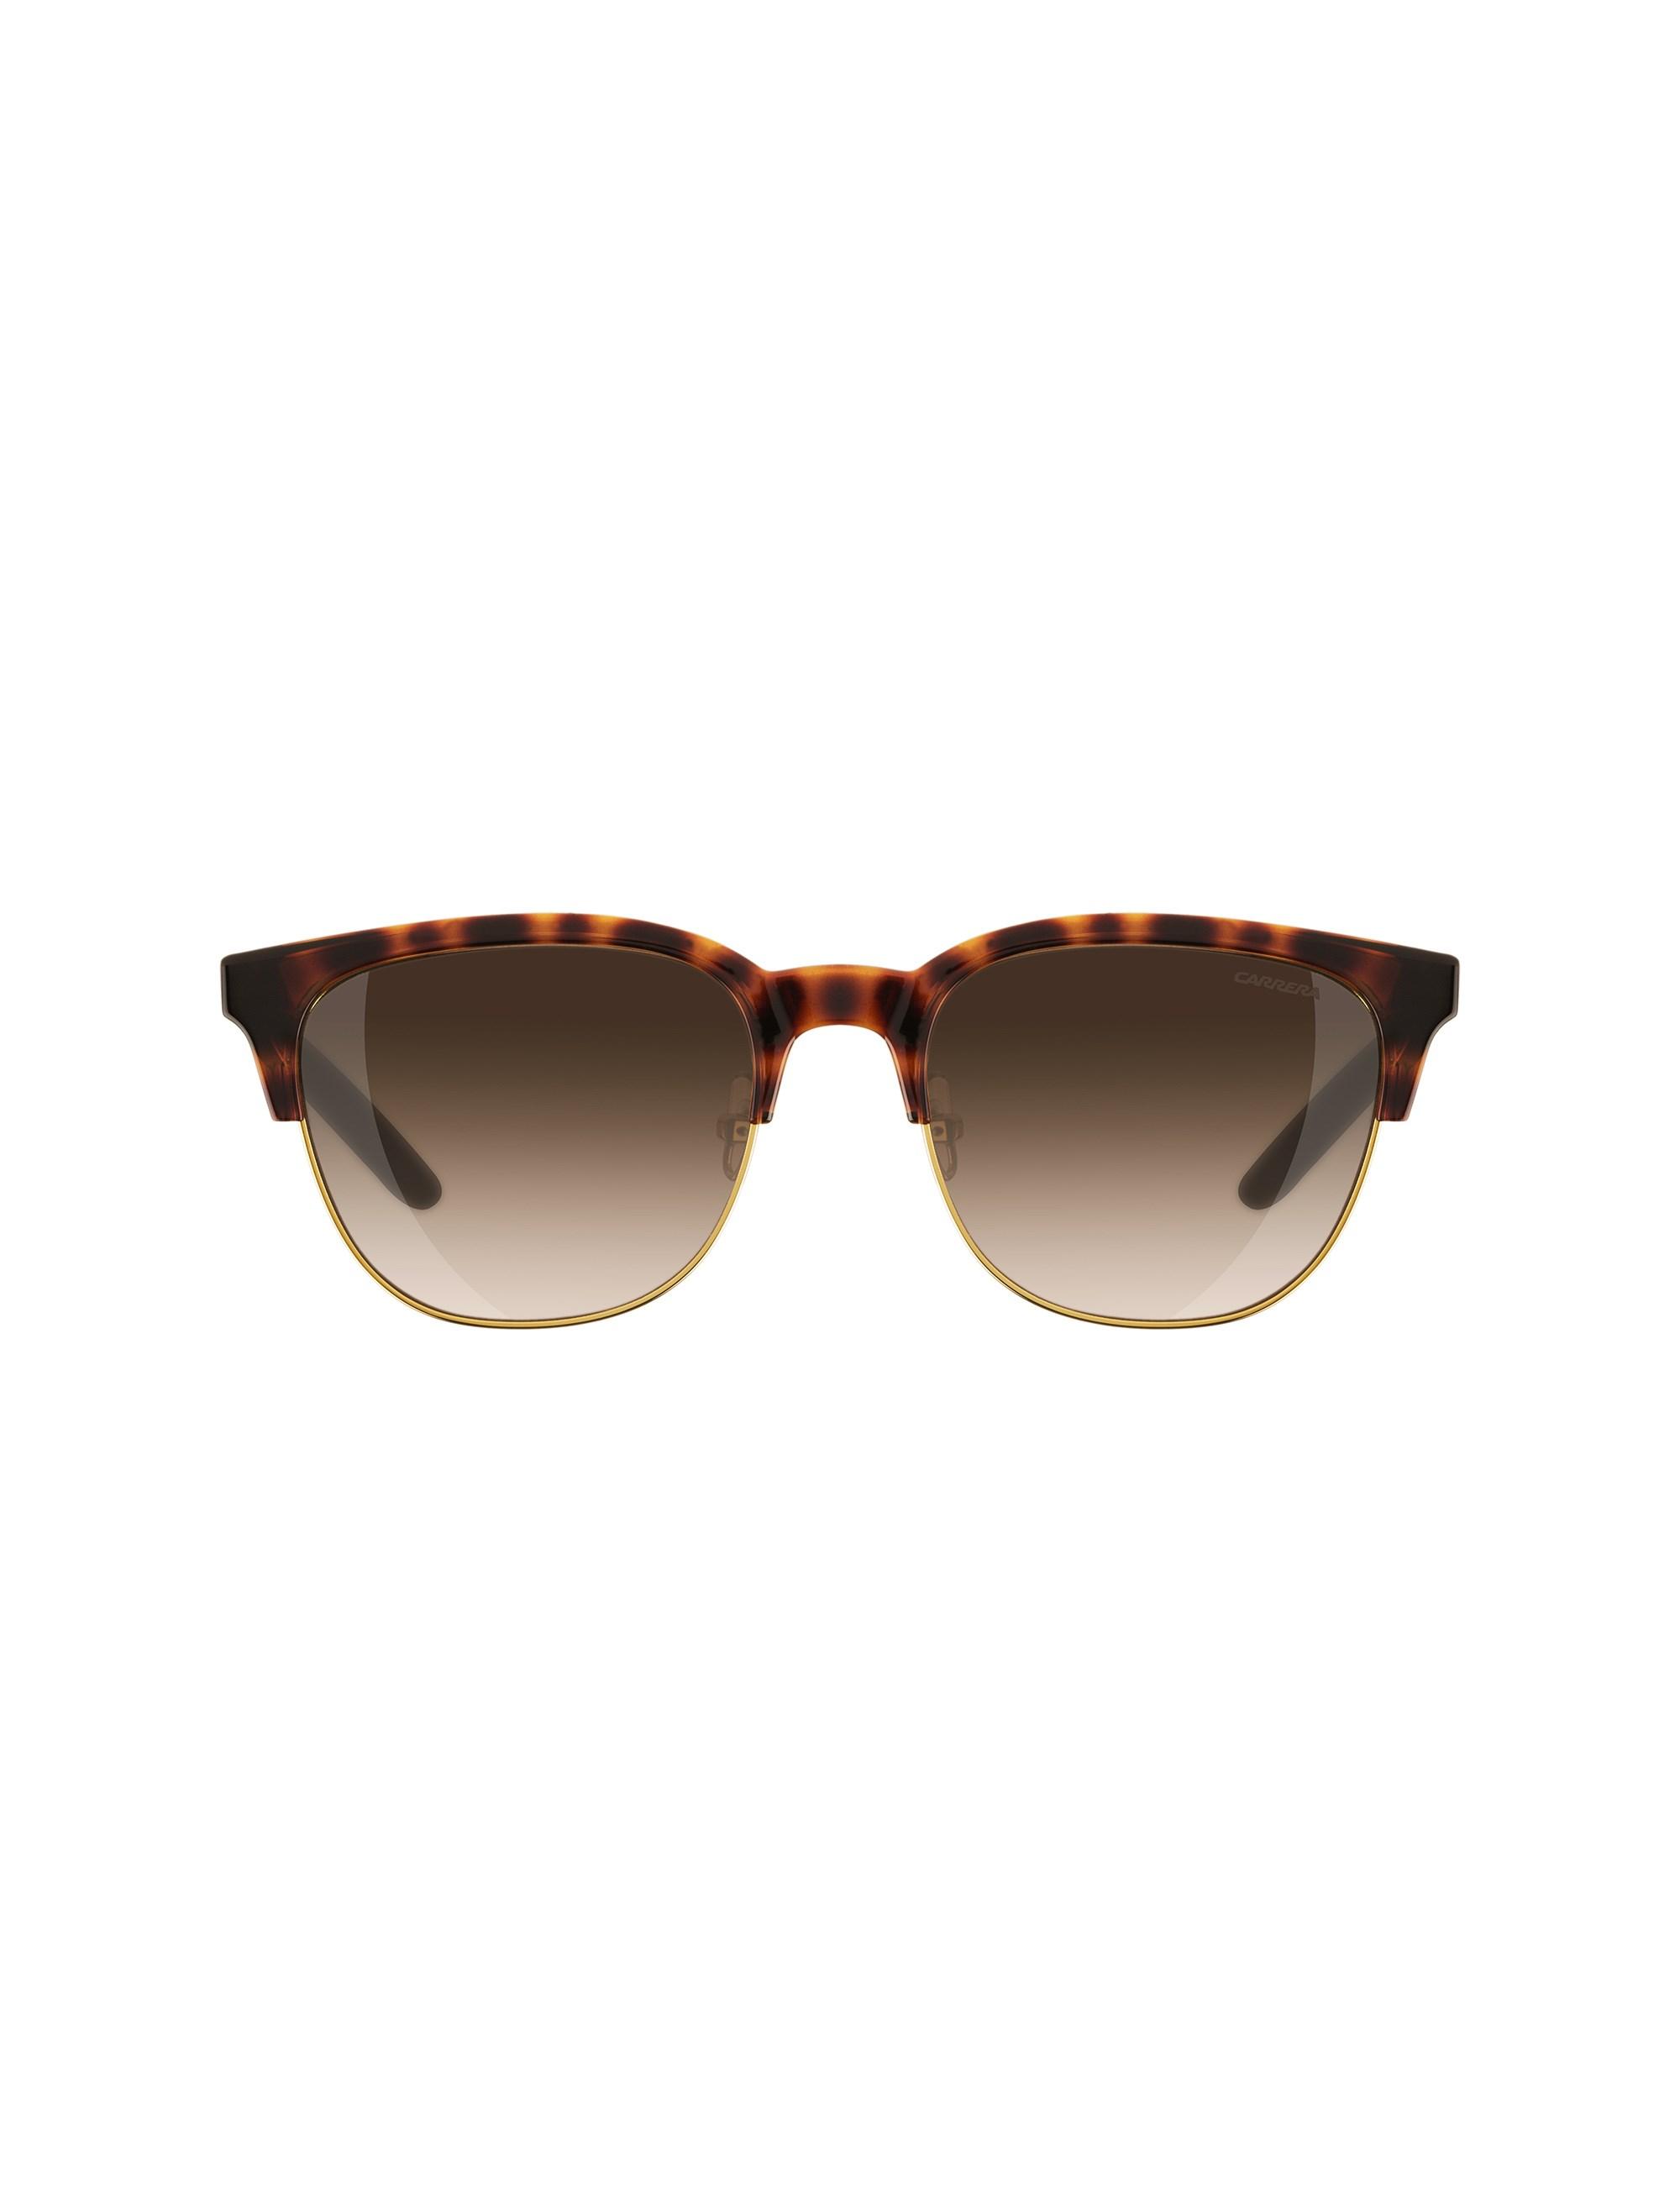 عینک آفتابی کلاب مستر بزرگسال - کاررا